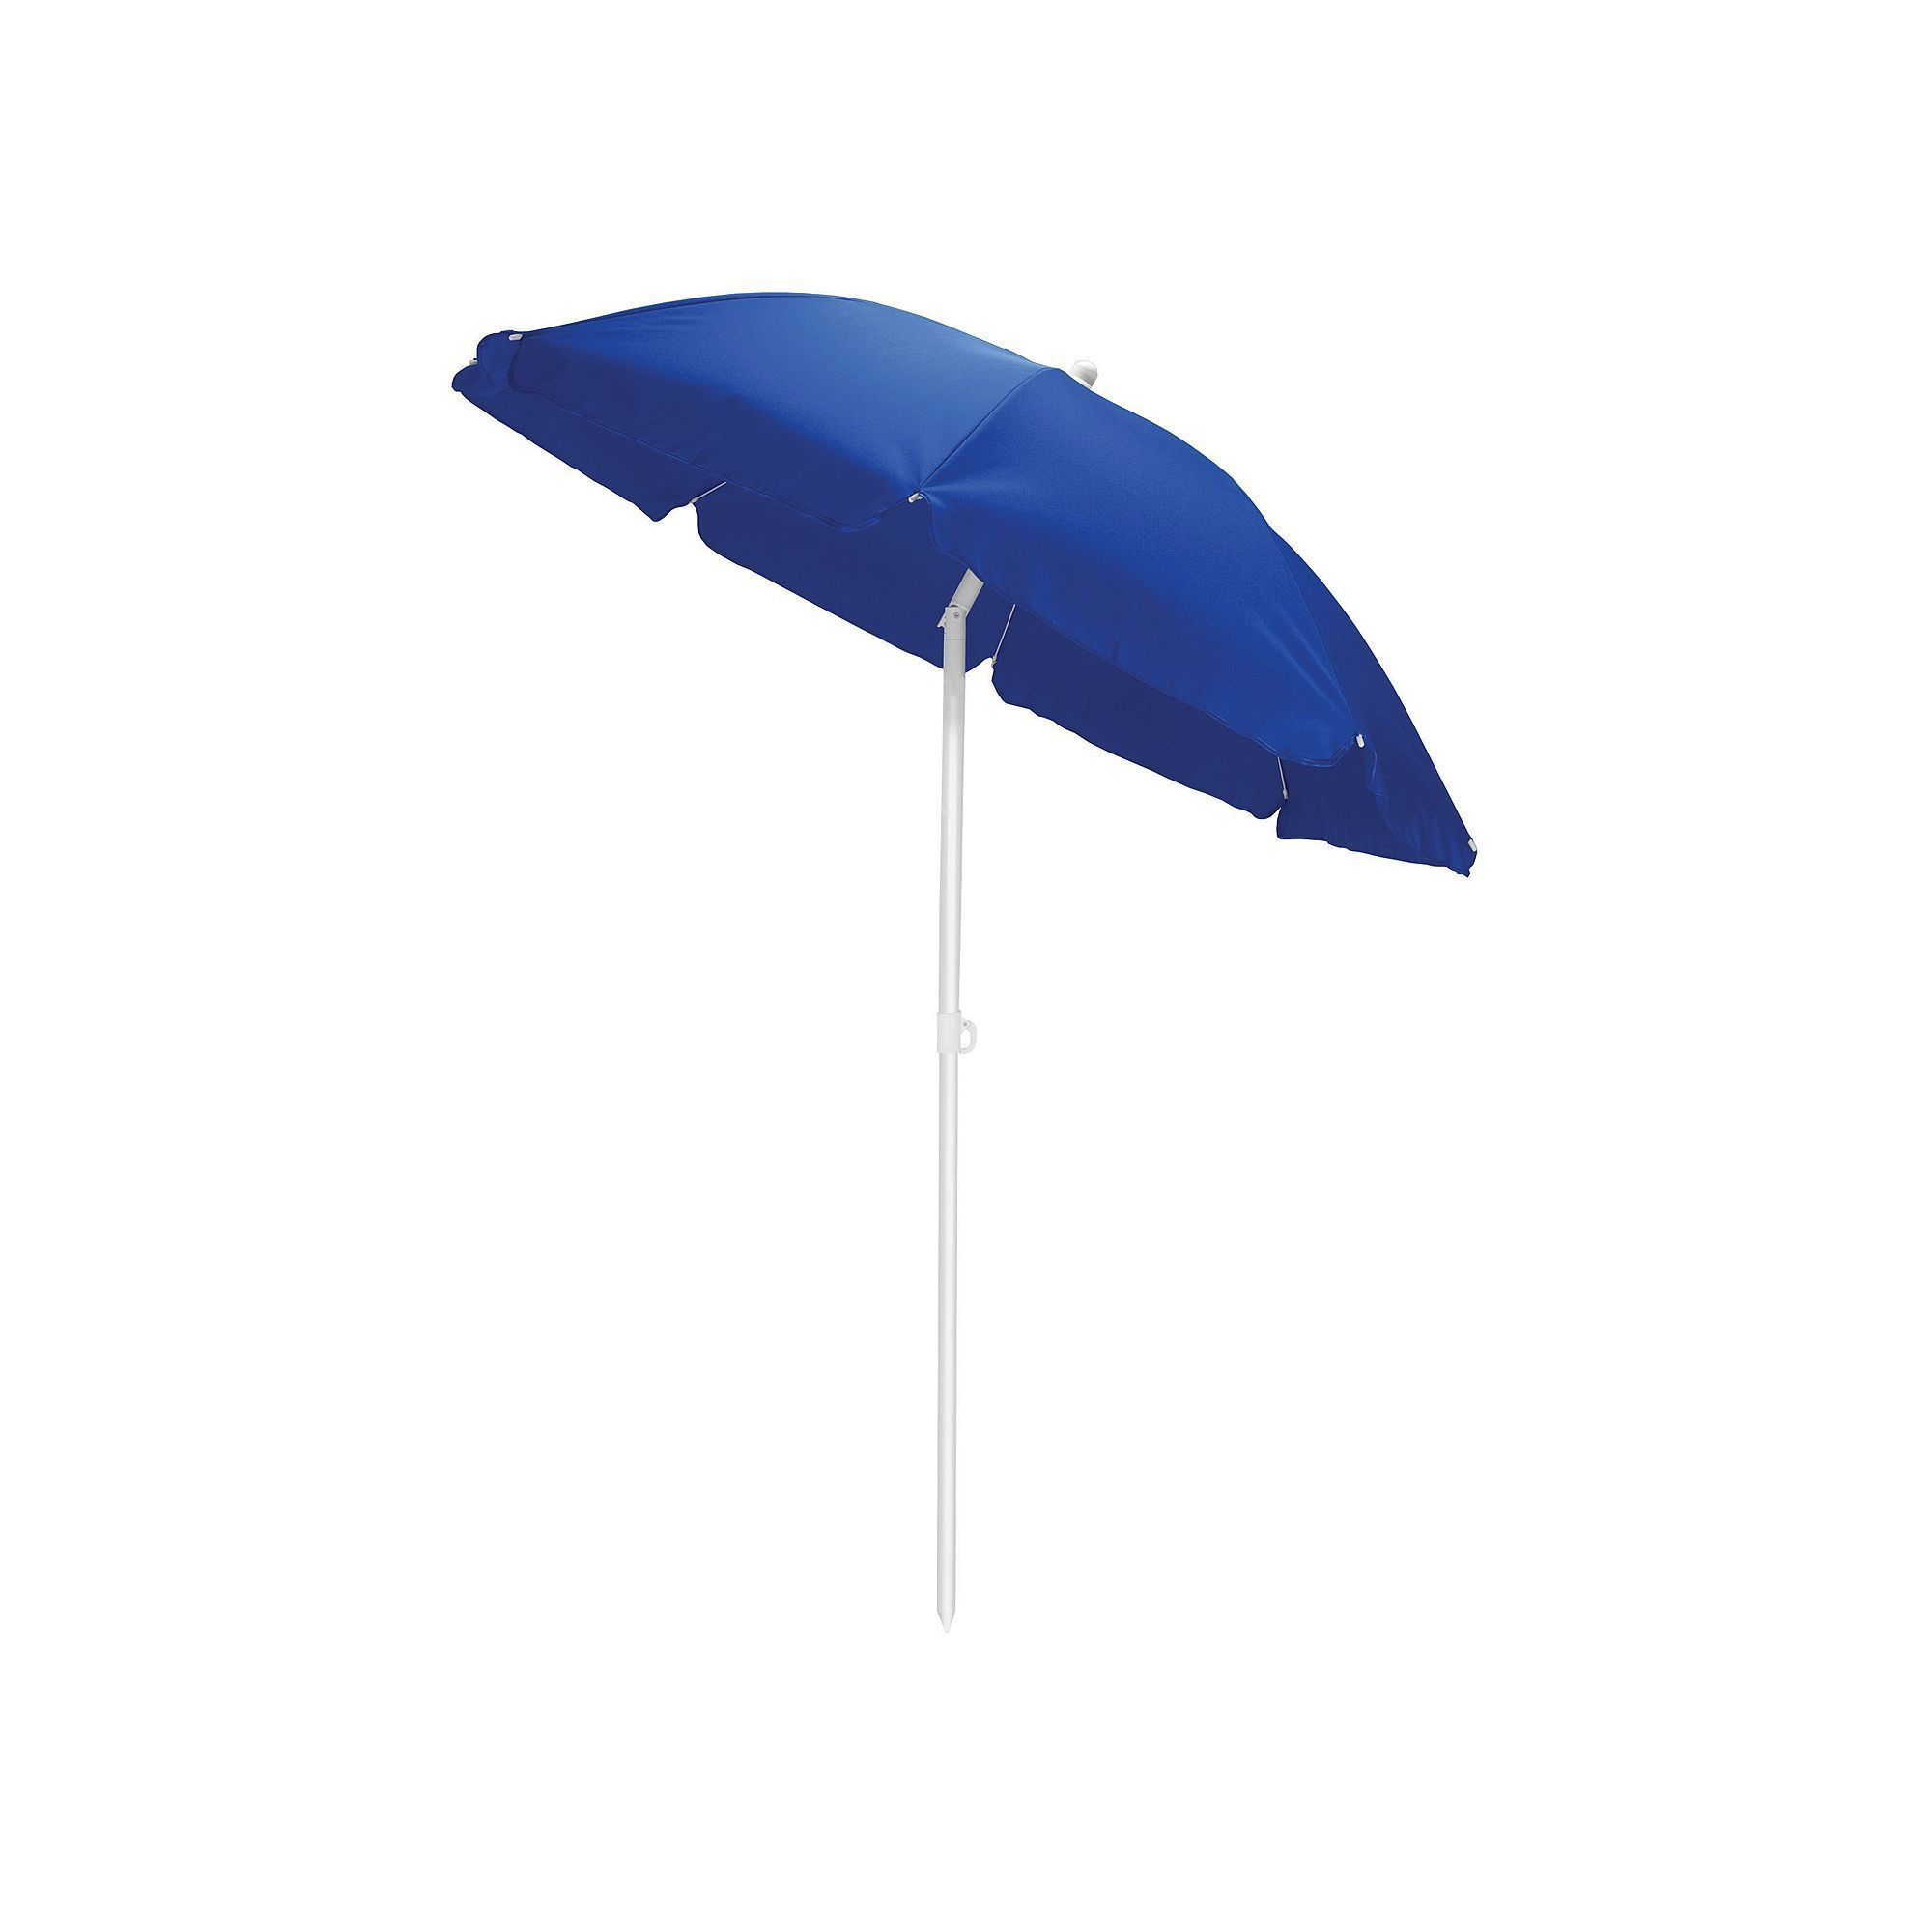 Patio Regarding Alyson Joeshade Beach Umbrellas (View 7 of 20)